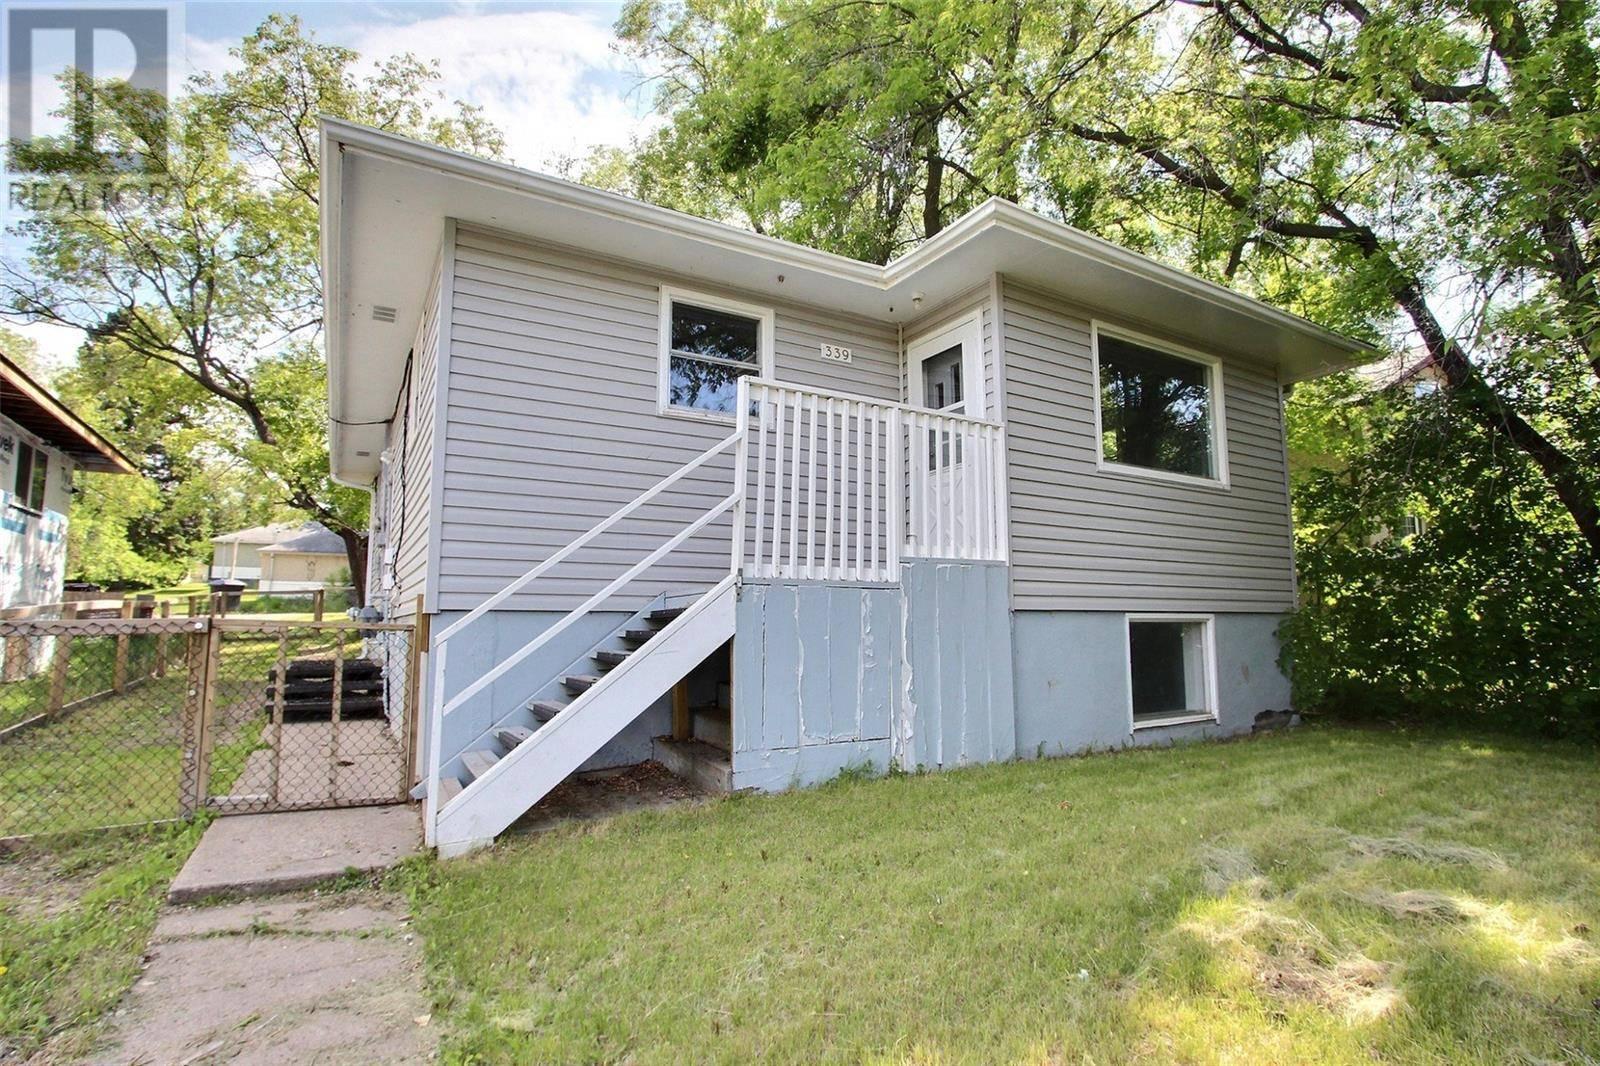 House for sale at 339 19th St E Prince Albert Saskatchewan - MLS: SK776369